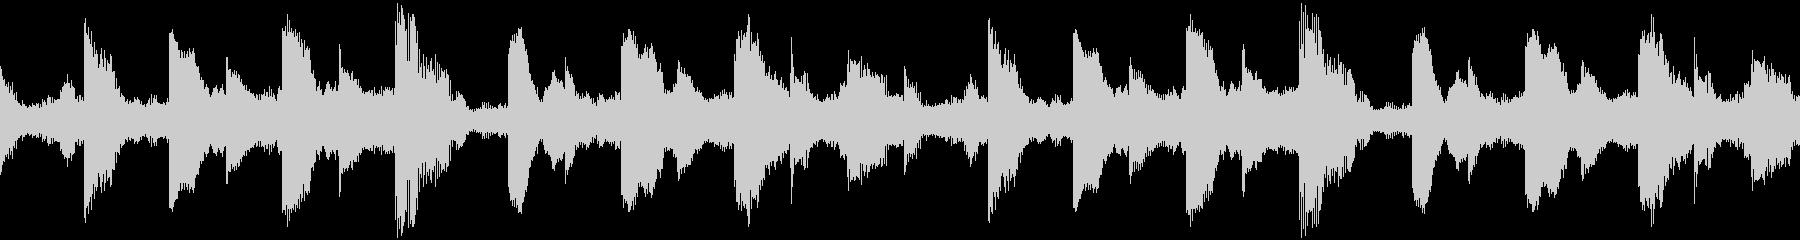 EDM リードシンセ 9 音楽制作用の未再生の波形